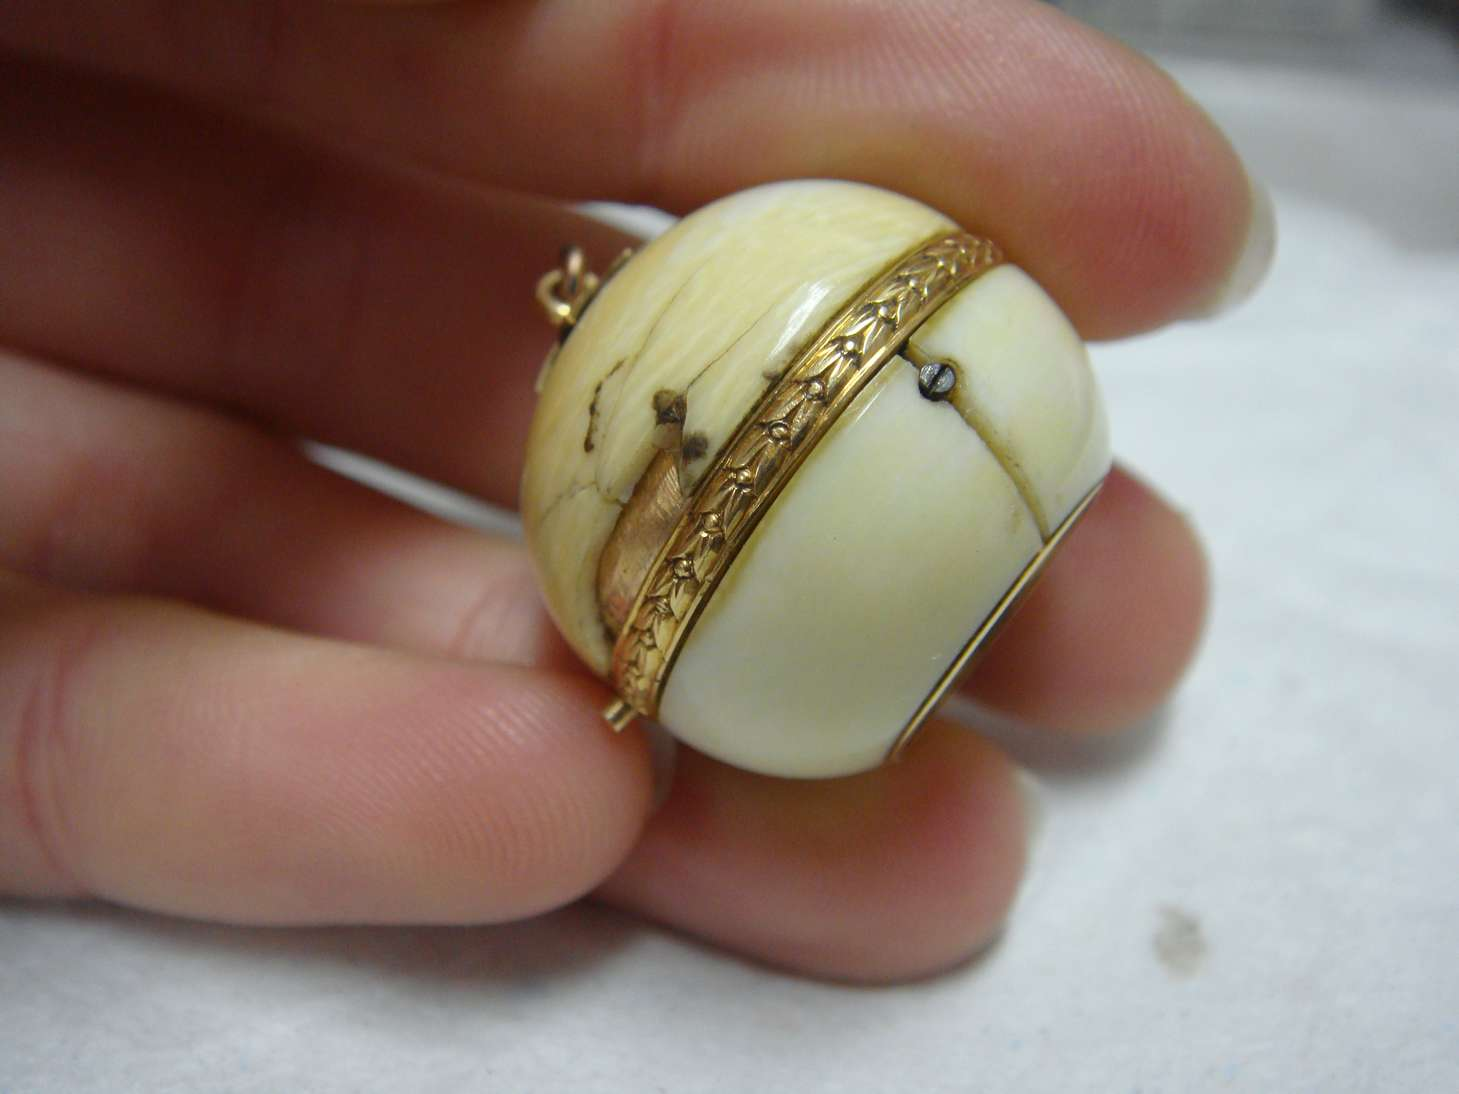 boule-geneve-montre-luxe-ivoire-horlogerie-cabinotier-art-restauration-restaurarte-ancien.jpg